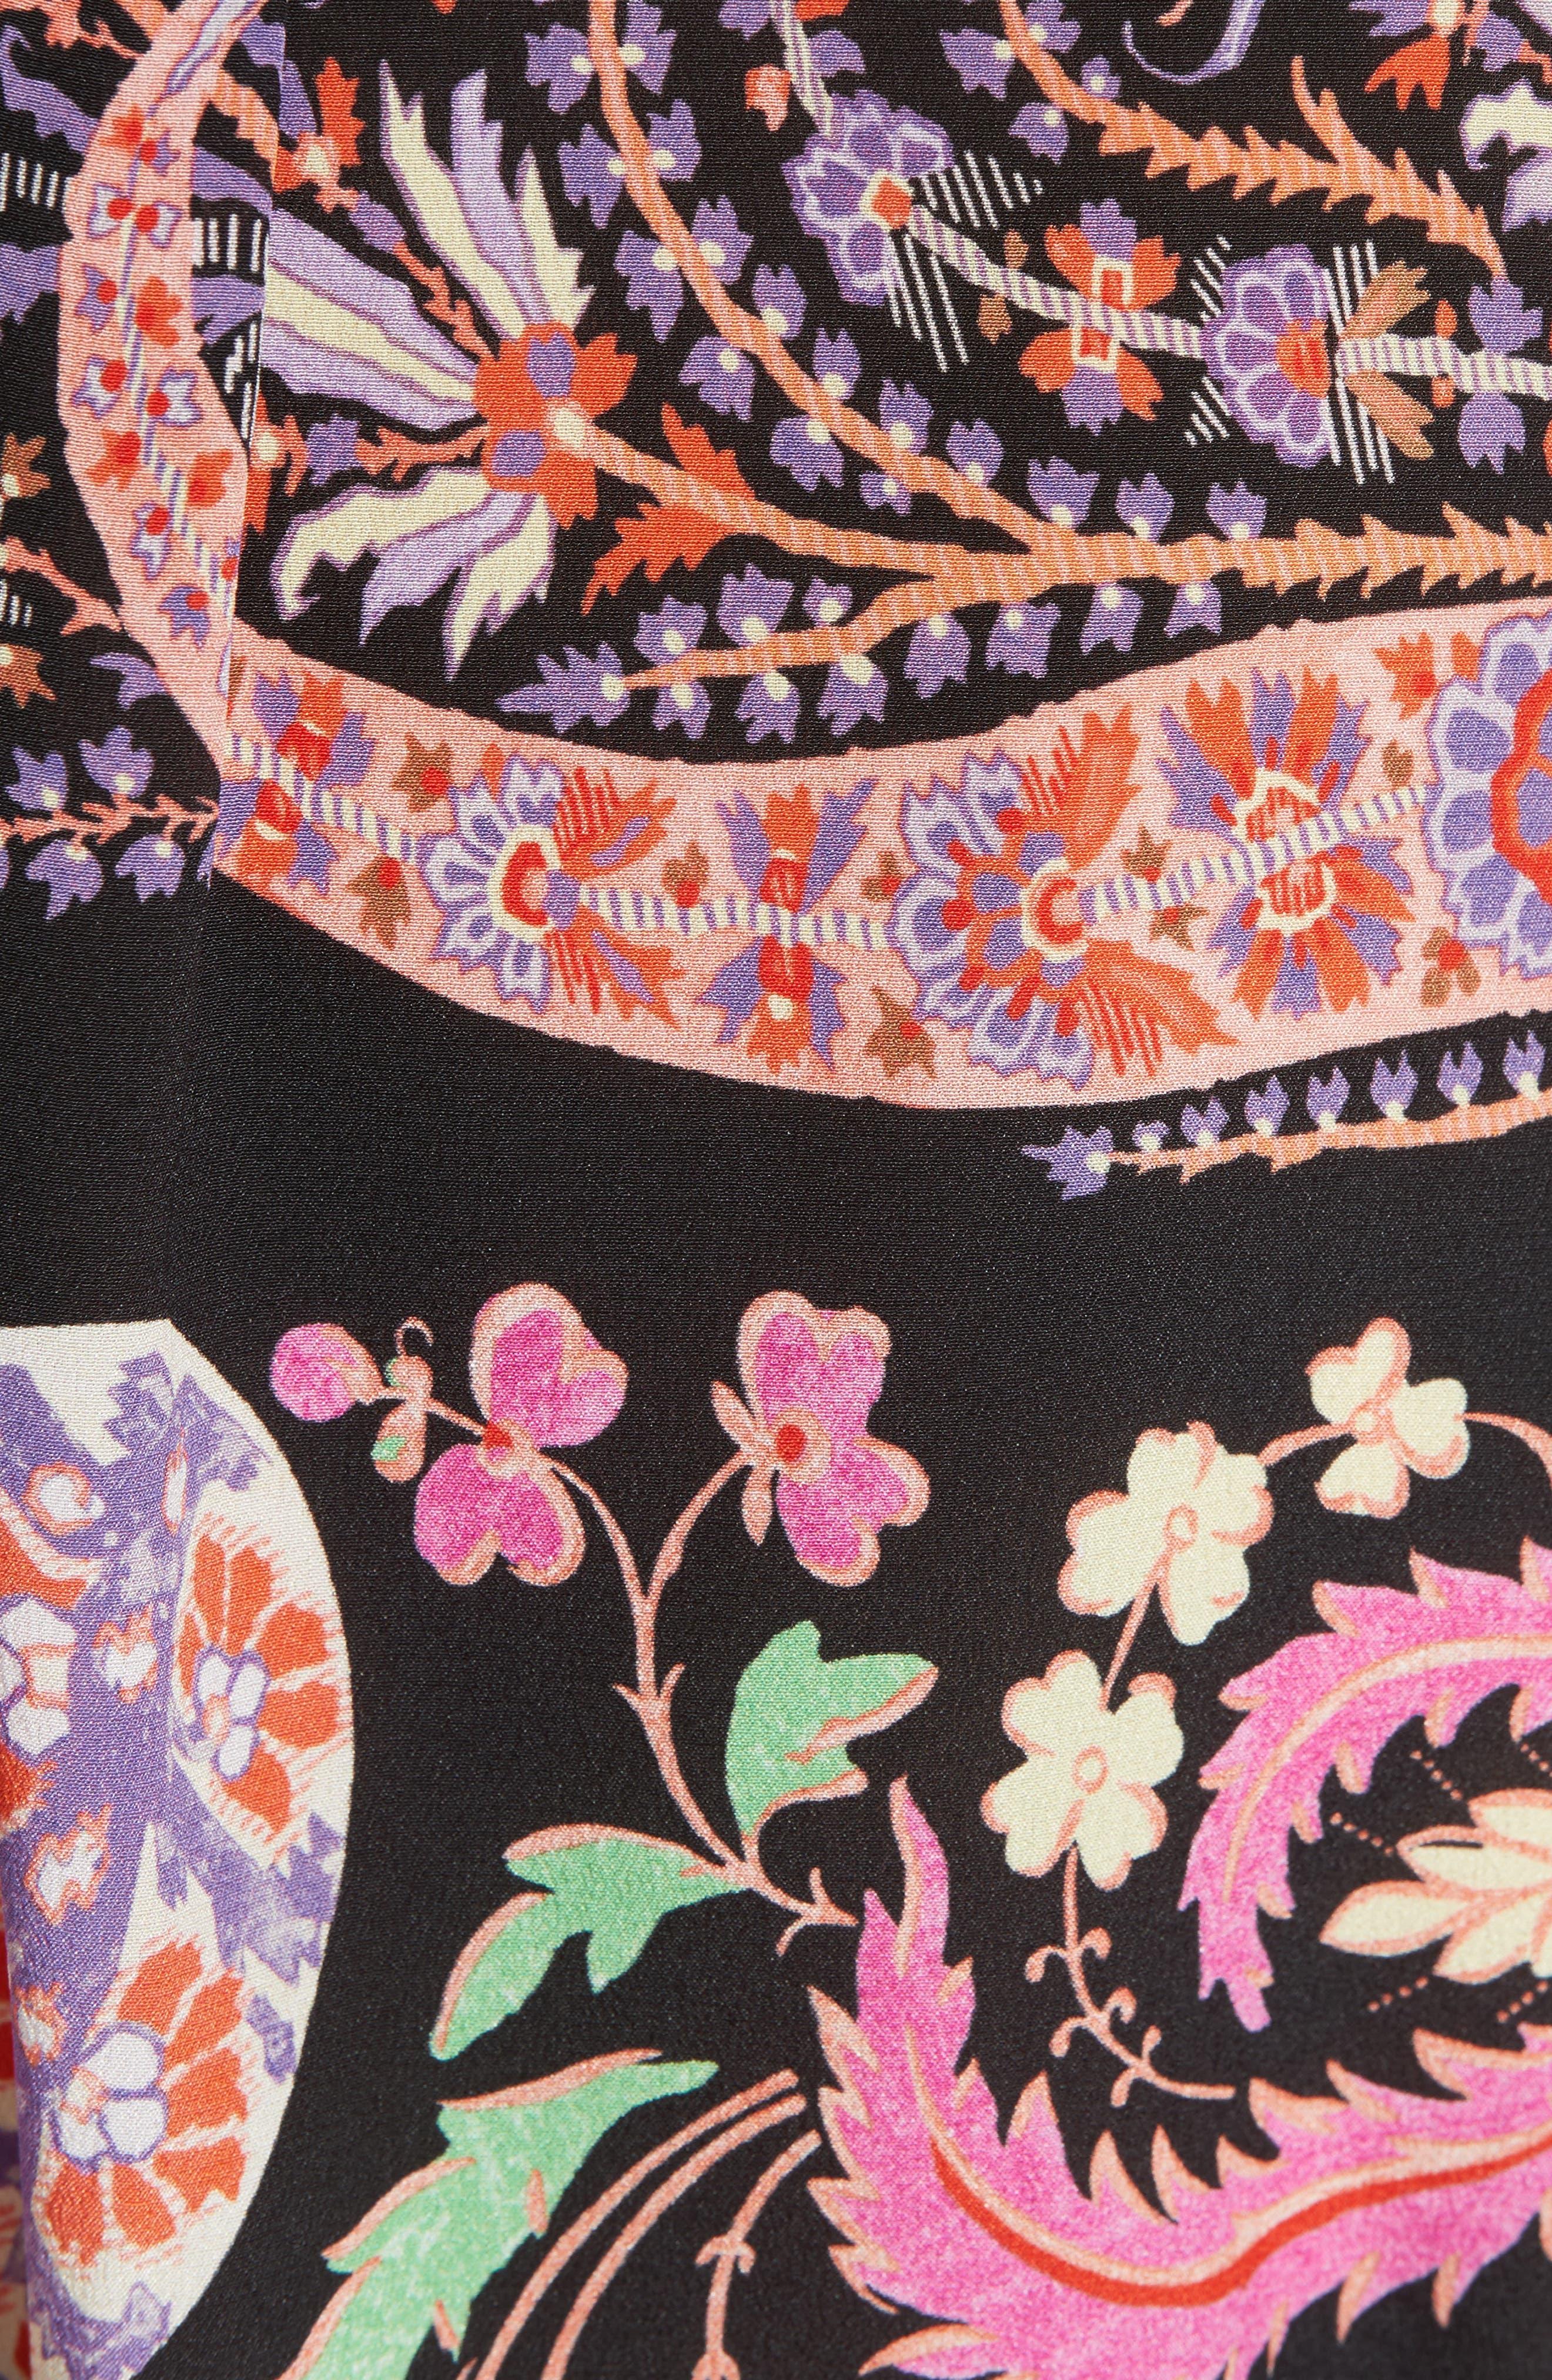 Floral Paisley Print Silk Tunic,                             Alternate thumbnail 5, color,                             001